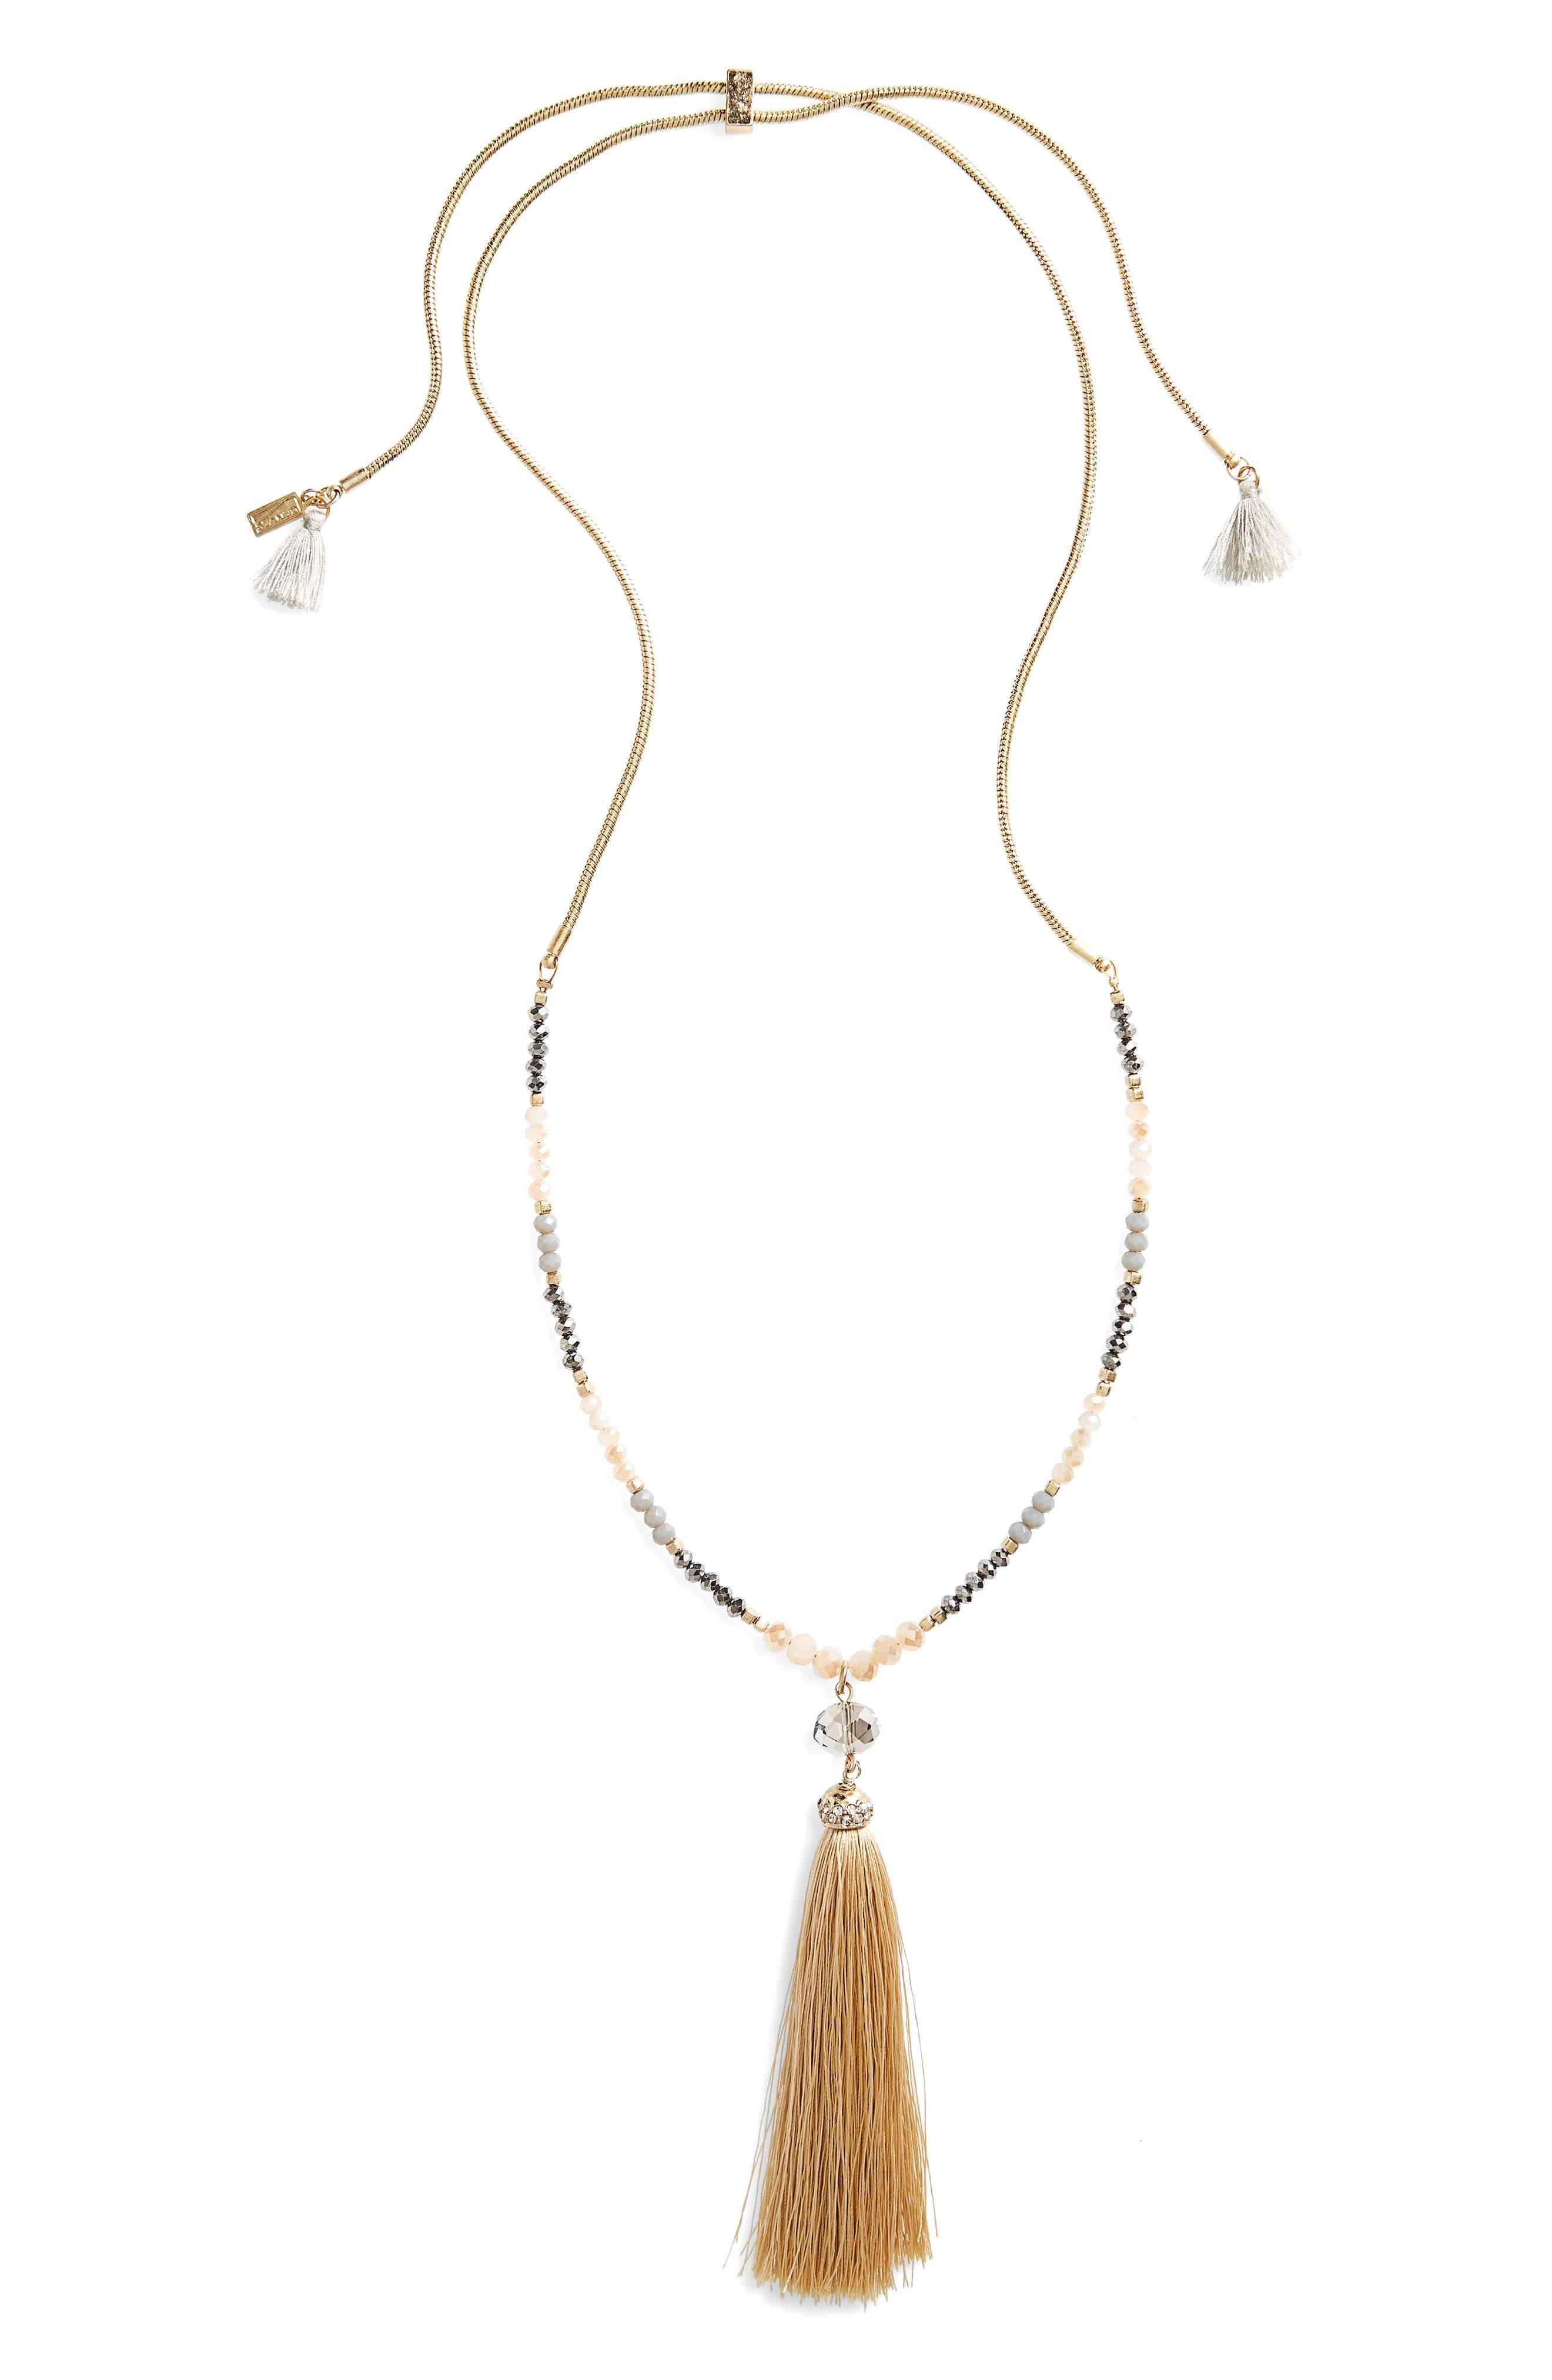 Adjustable Chain Necklace,                             Main thumbnail 1, color,                             Neutral